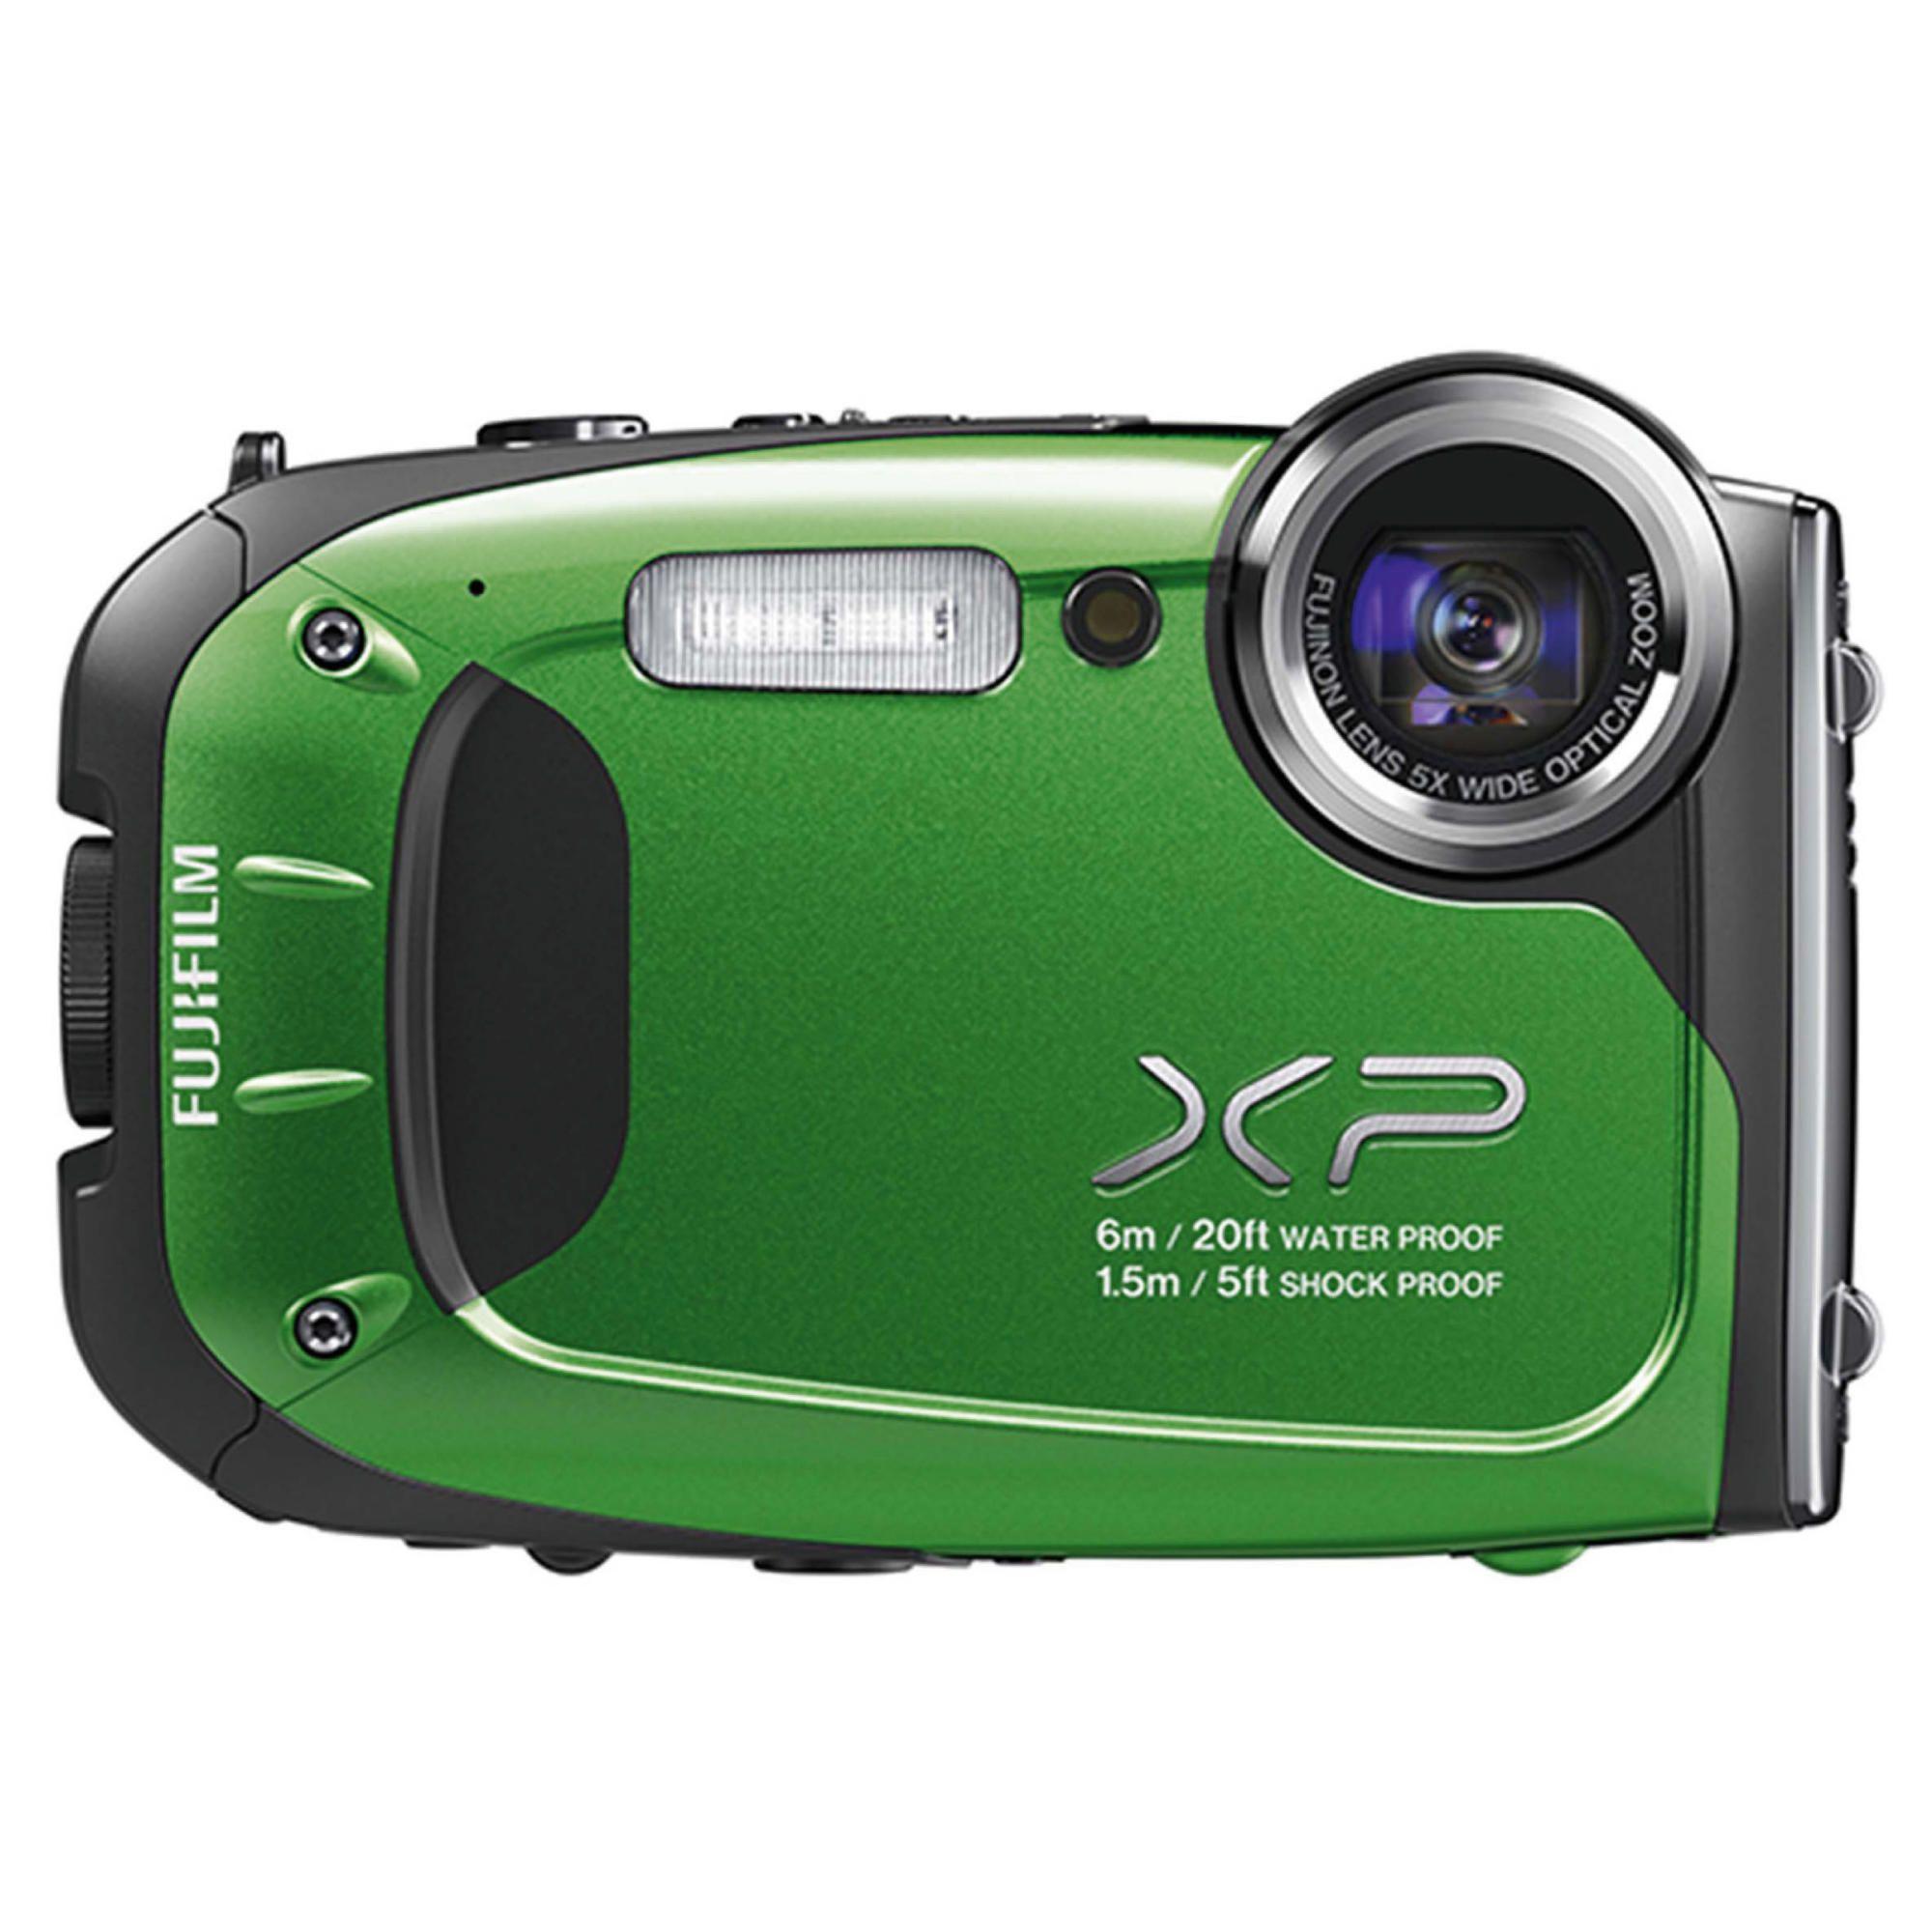 Fujifilm XP60 Tough Digital Camera, Green, 16MP, 5x Optical Zoom, 2.7 inch LCD Screen